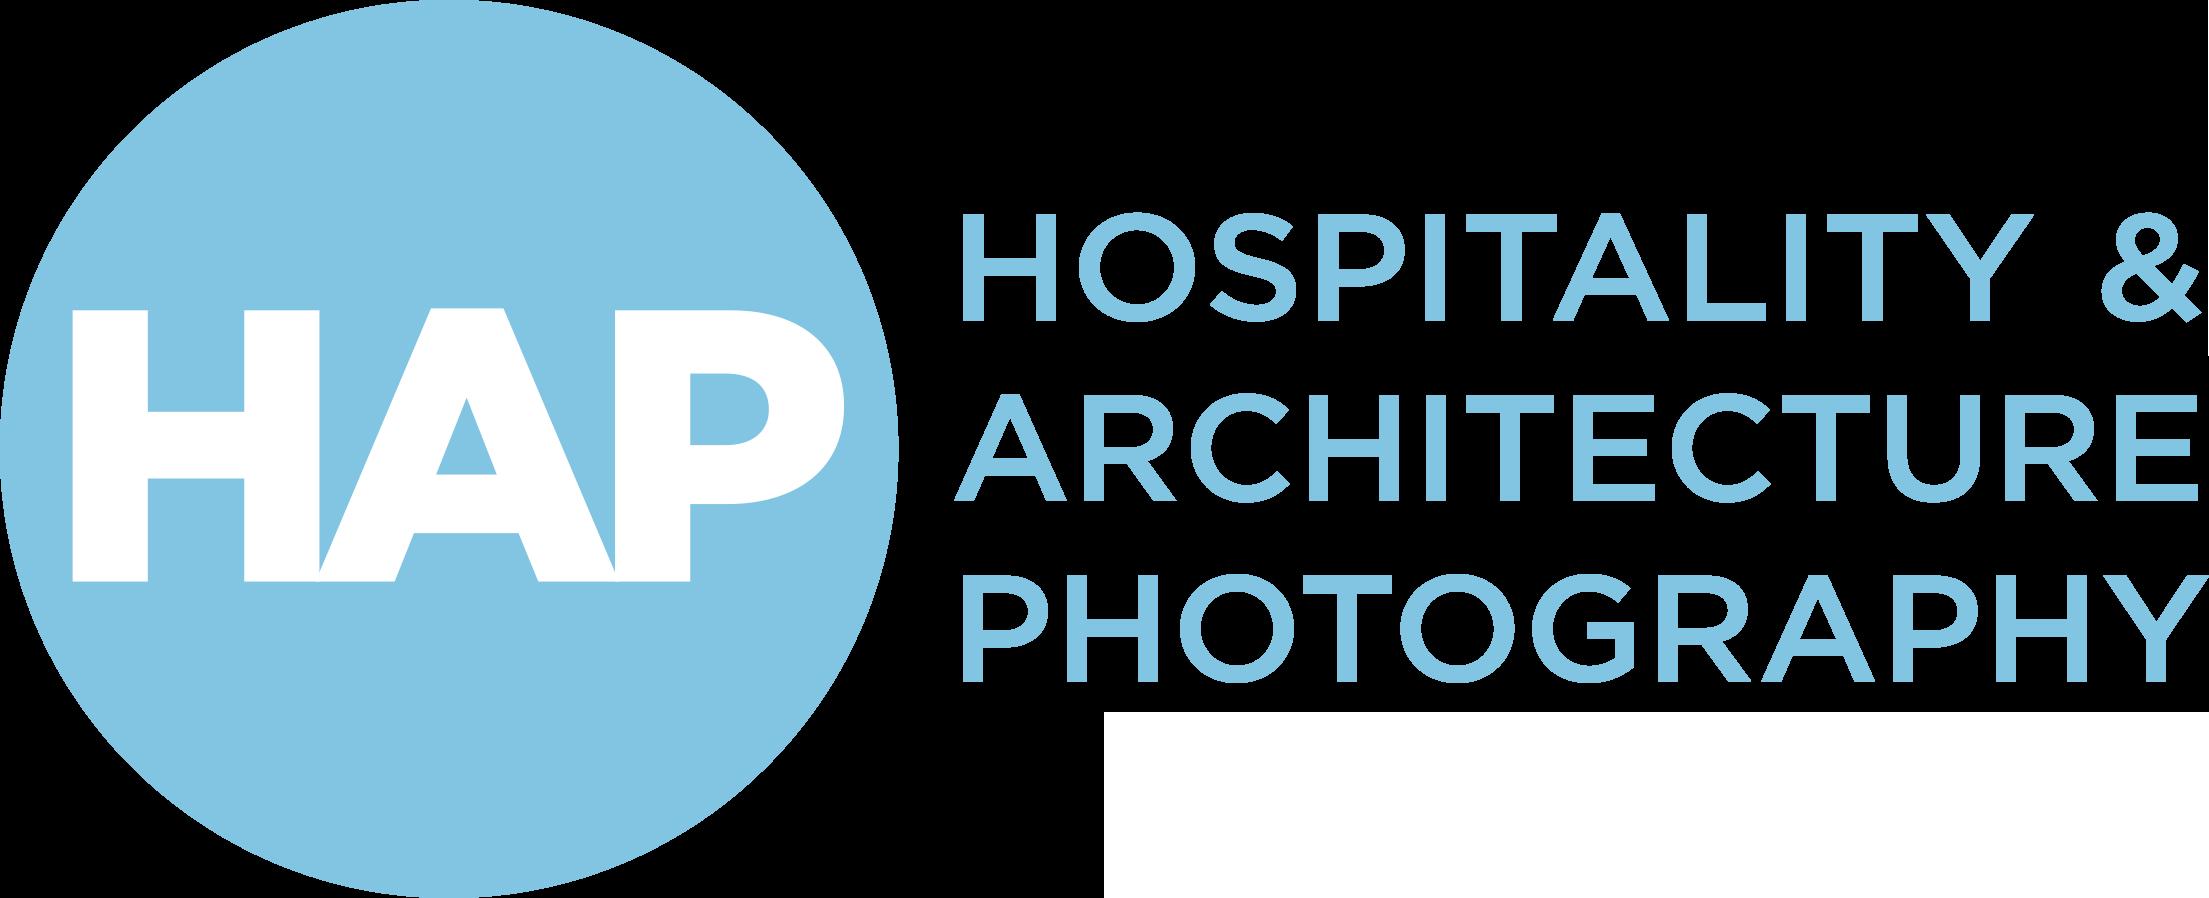 Hospitality & Architecture Photography